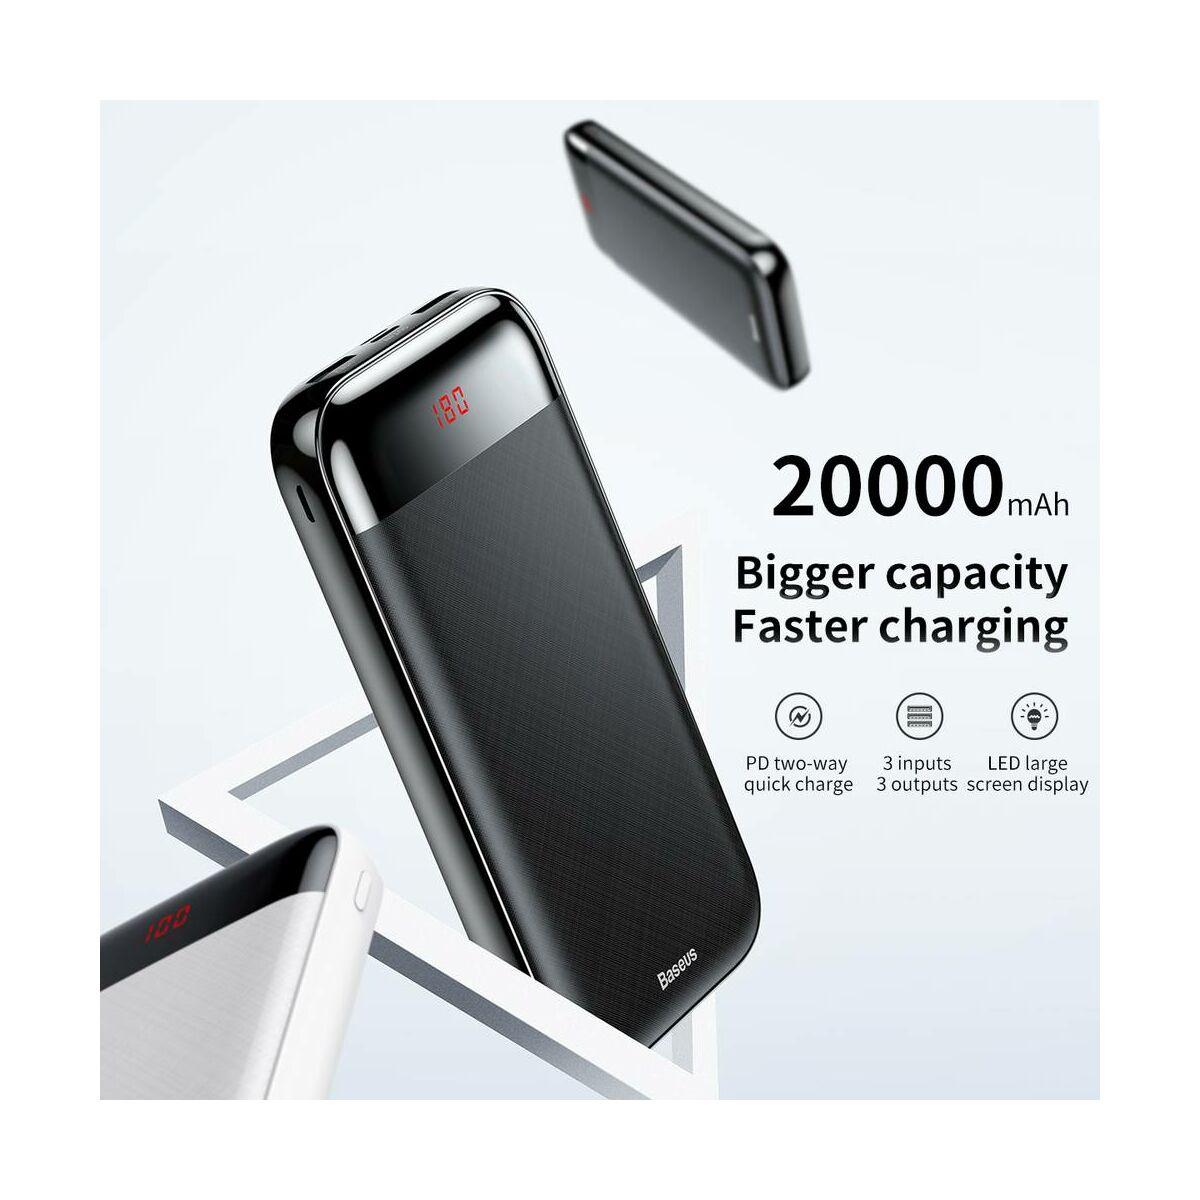 Baseus Power Bank Mini Cu, digitális kijelző (Micro USB bemenet / dupla USB kimenet), 3A, 20.000 mAh, fekete (PPALL-CKU01)